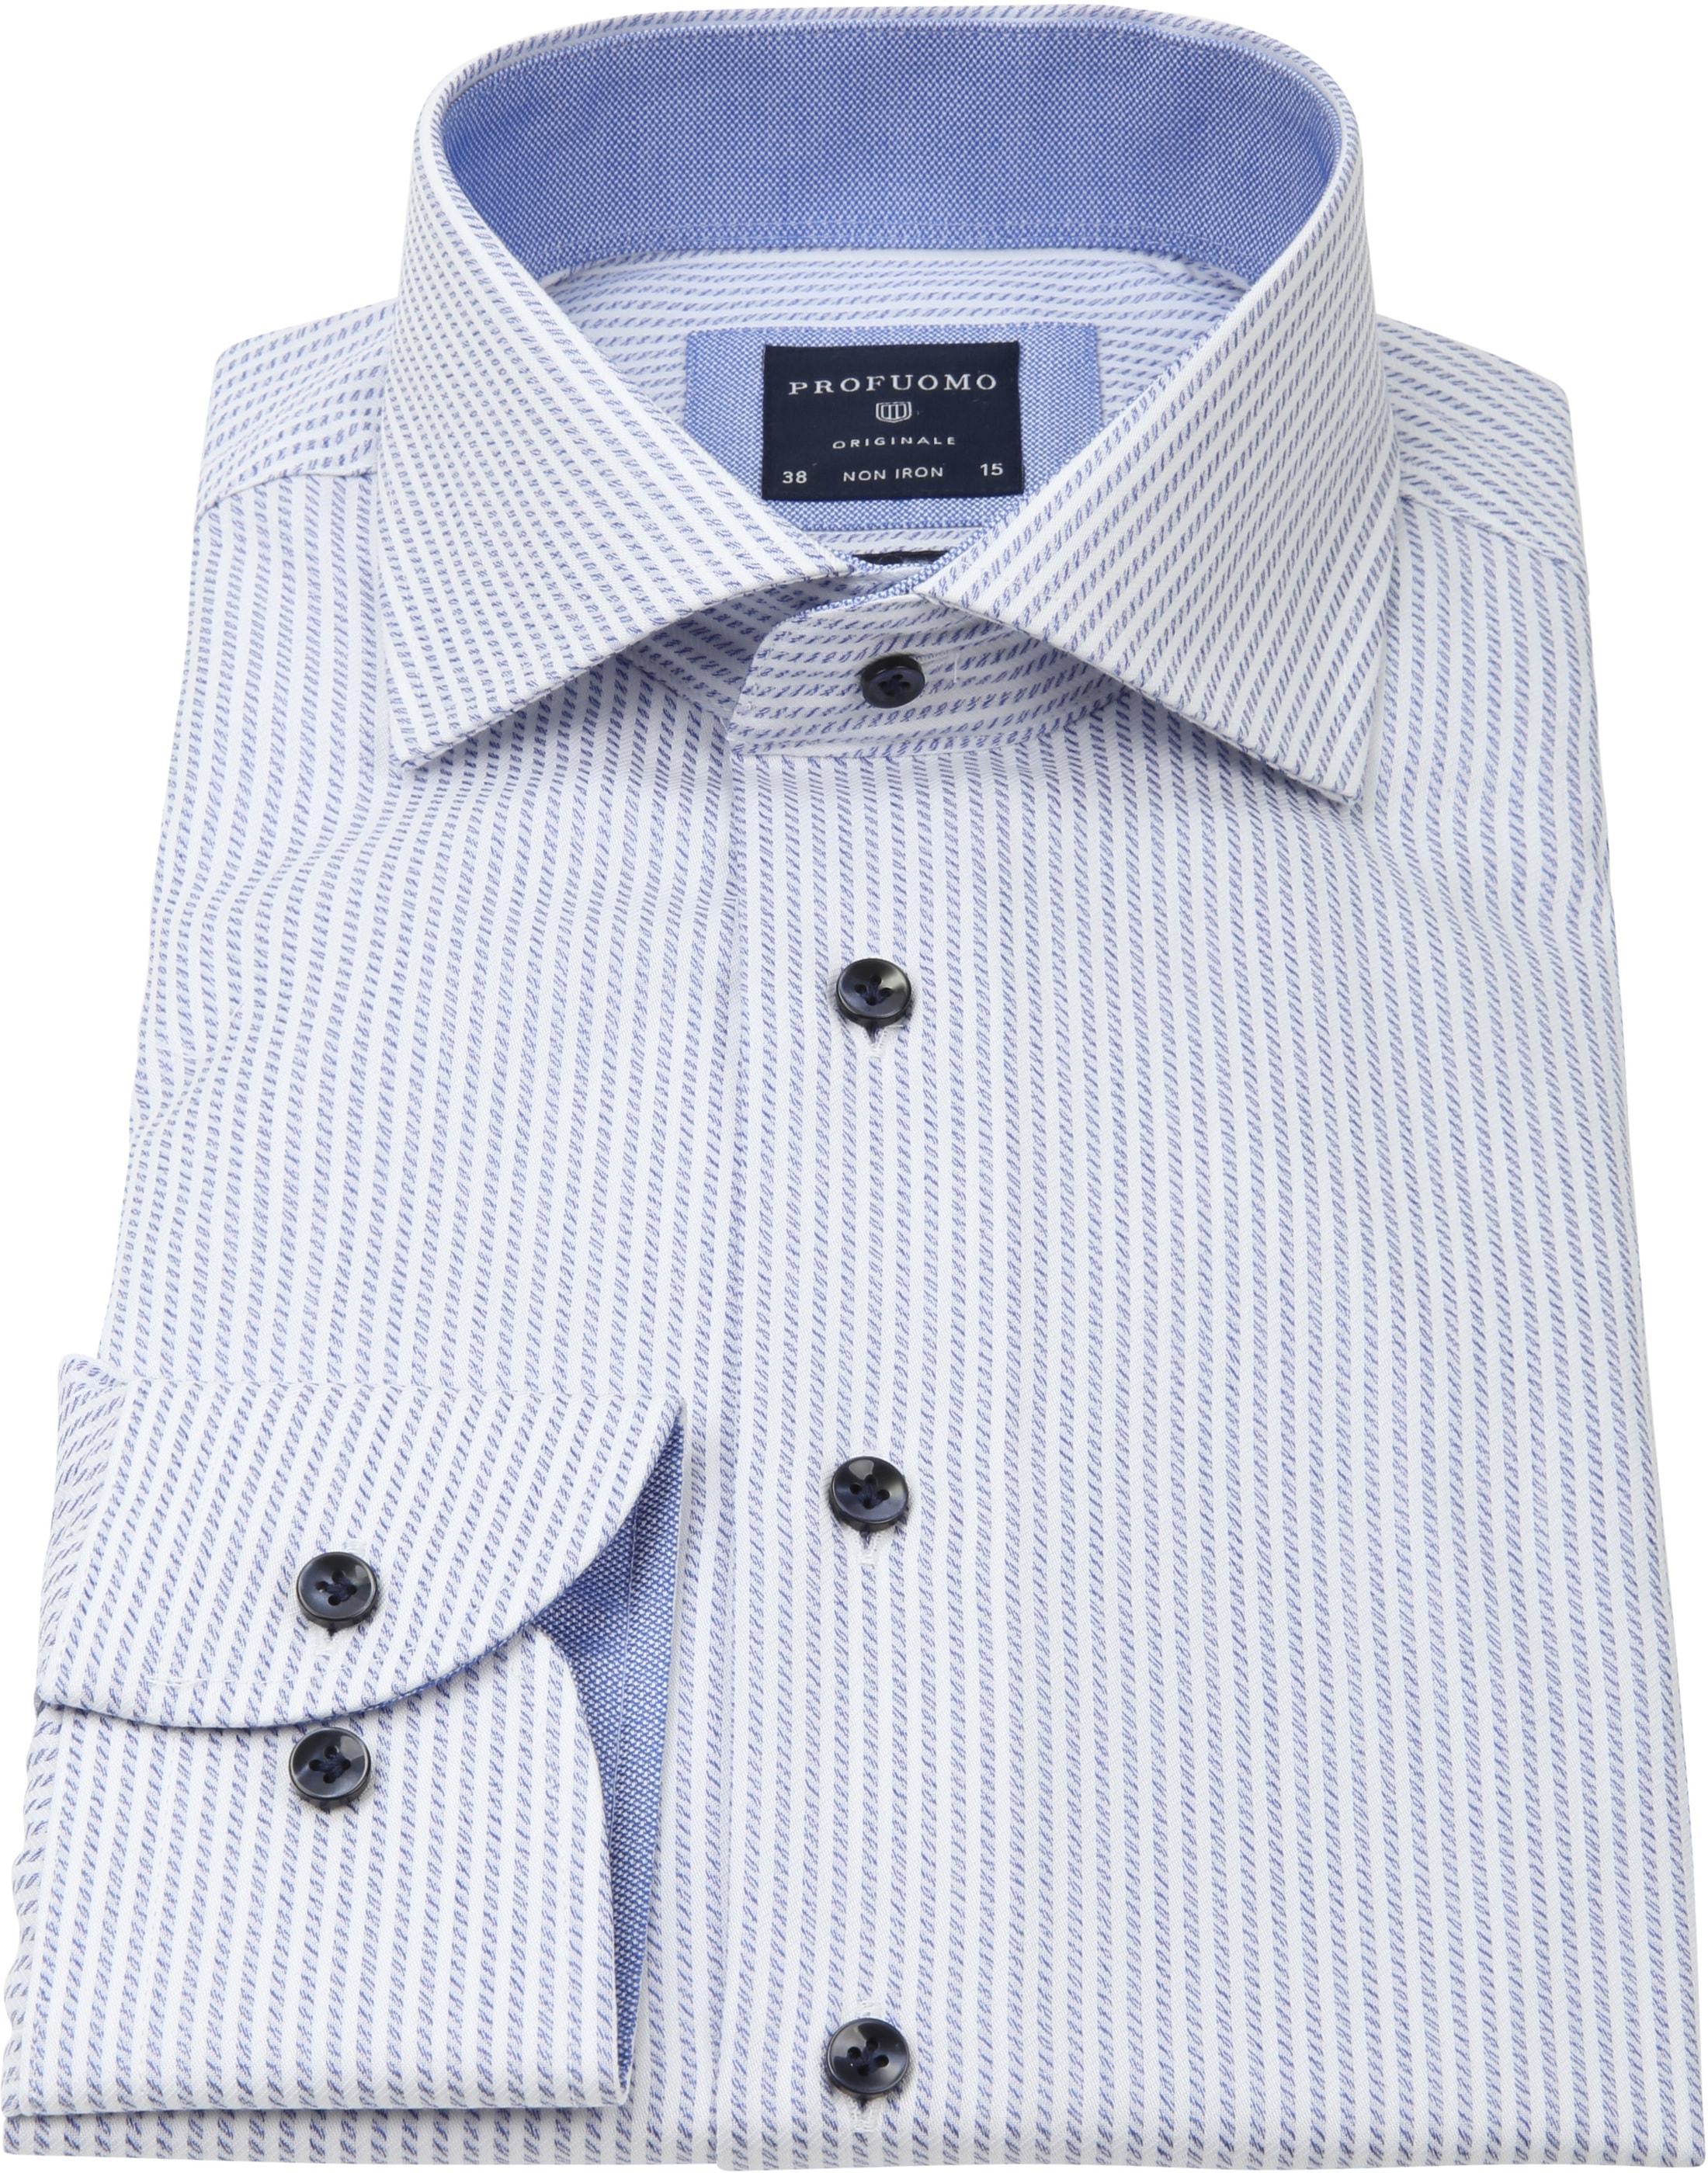 Profuomo Slim-Fit Overhemd Blauw foto 2